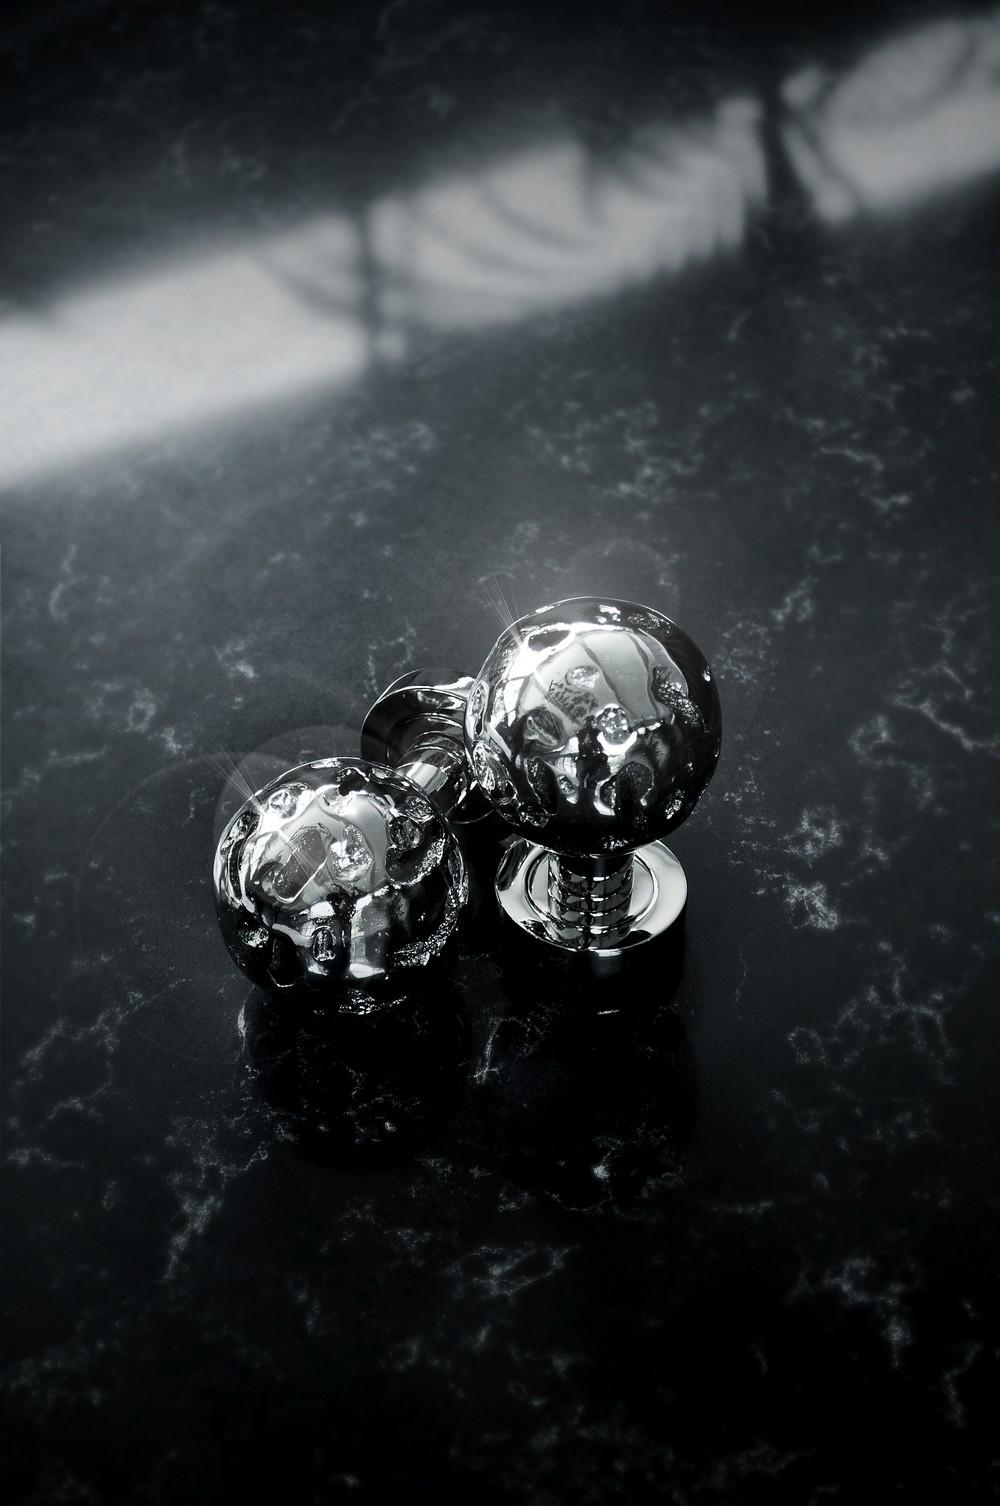 Admire 9 Exclusive Decorative Hardware Pieces in Lustrous Silver Tones 8 decorative hardware Admire 9 Exclusive Decorative Hardware Pieces in Lustrous Silver Tones Admire 9 Exclusive Decorative Hardware Pieces in Lustrous Silver Tones 8